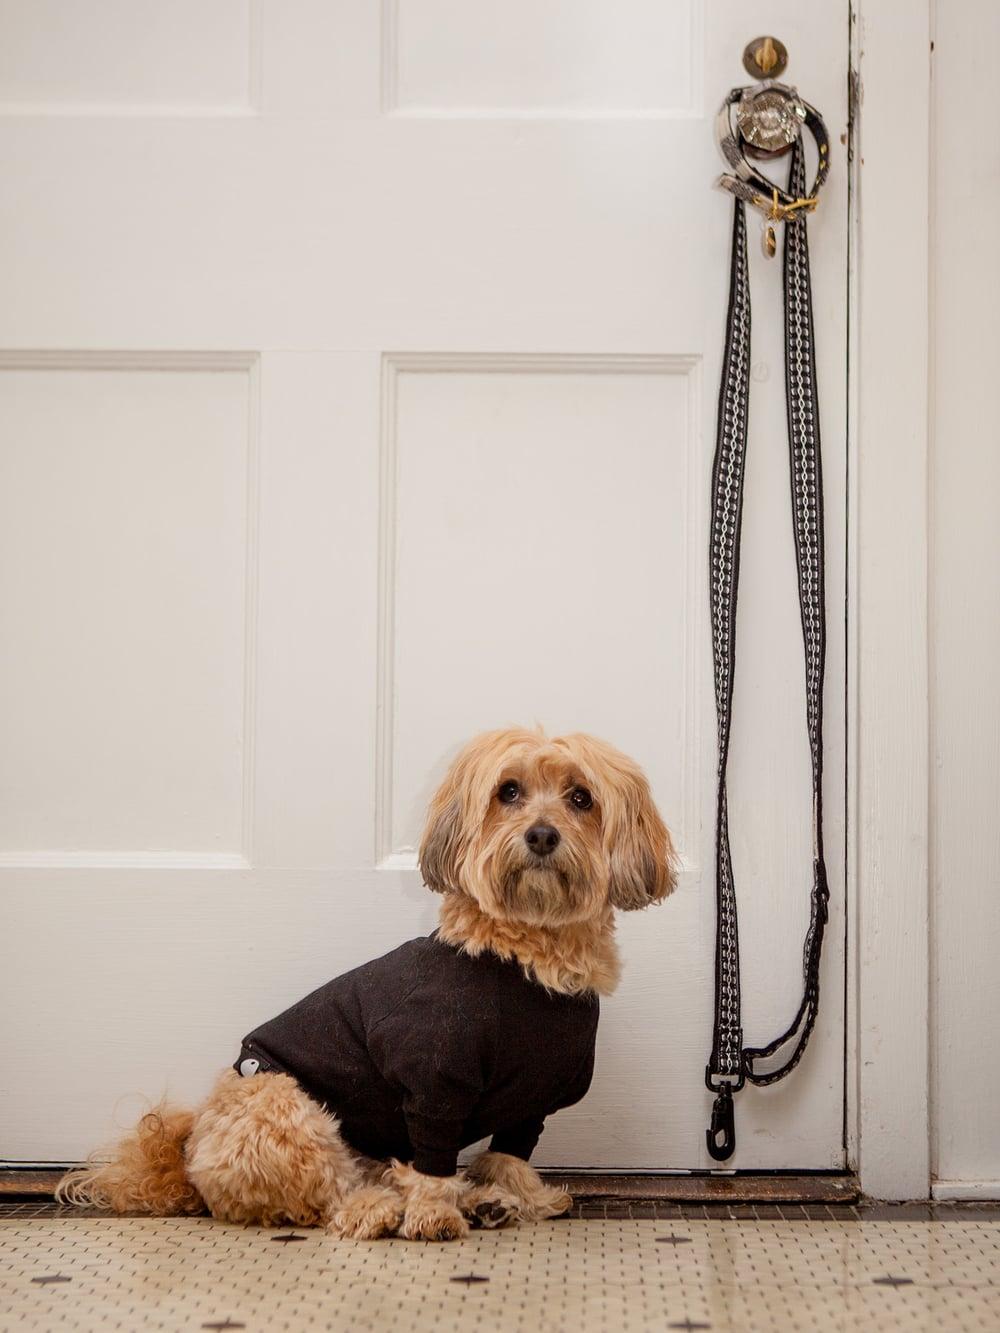 DOG & CO. | Little Black T-Shirt + ALLKU PET | Leash in Black